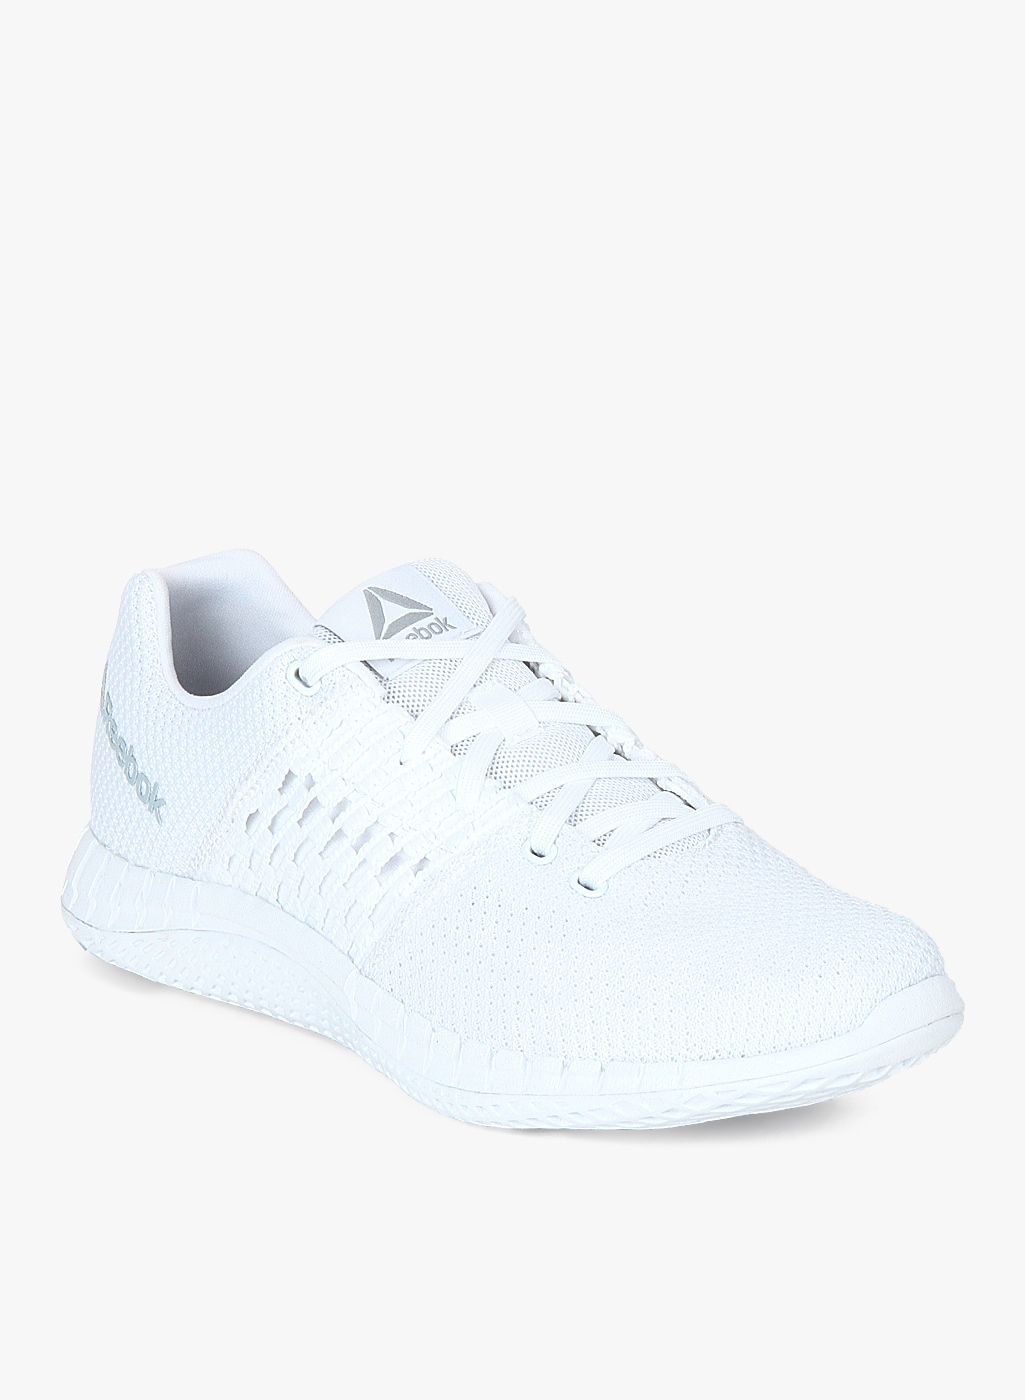 406a8866d3c Reebok Sweatshirts Sports Shoes - Buy Reebok Sweatshirts Sports Shoes online  in India